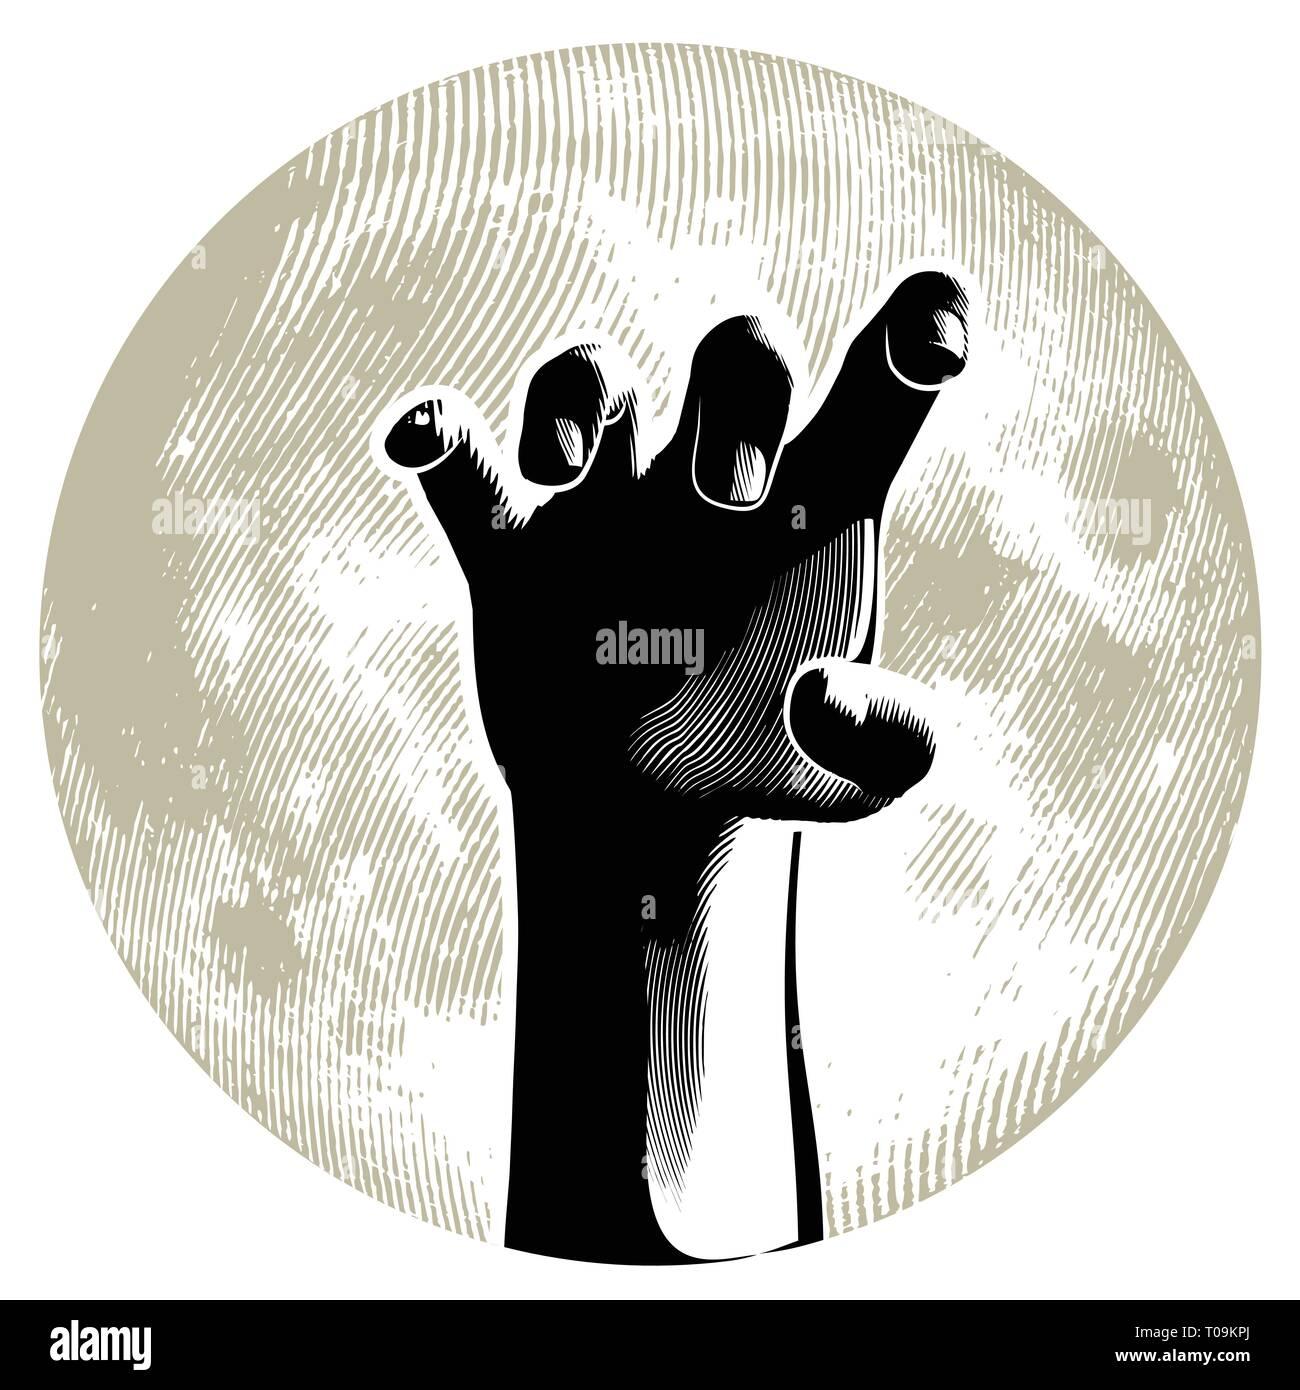 Halloween design. Zombie hand on the full moon. Linocut style. - Stock Image